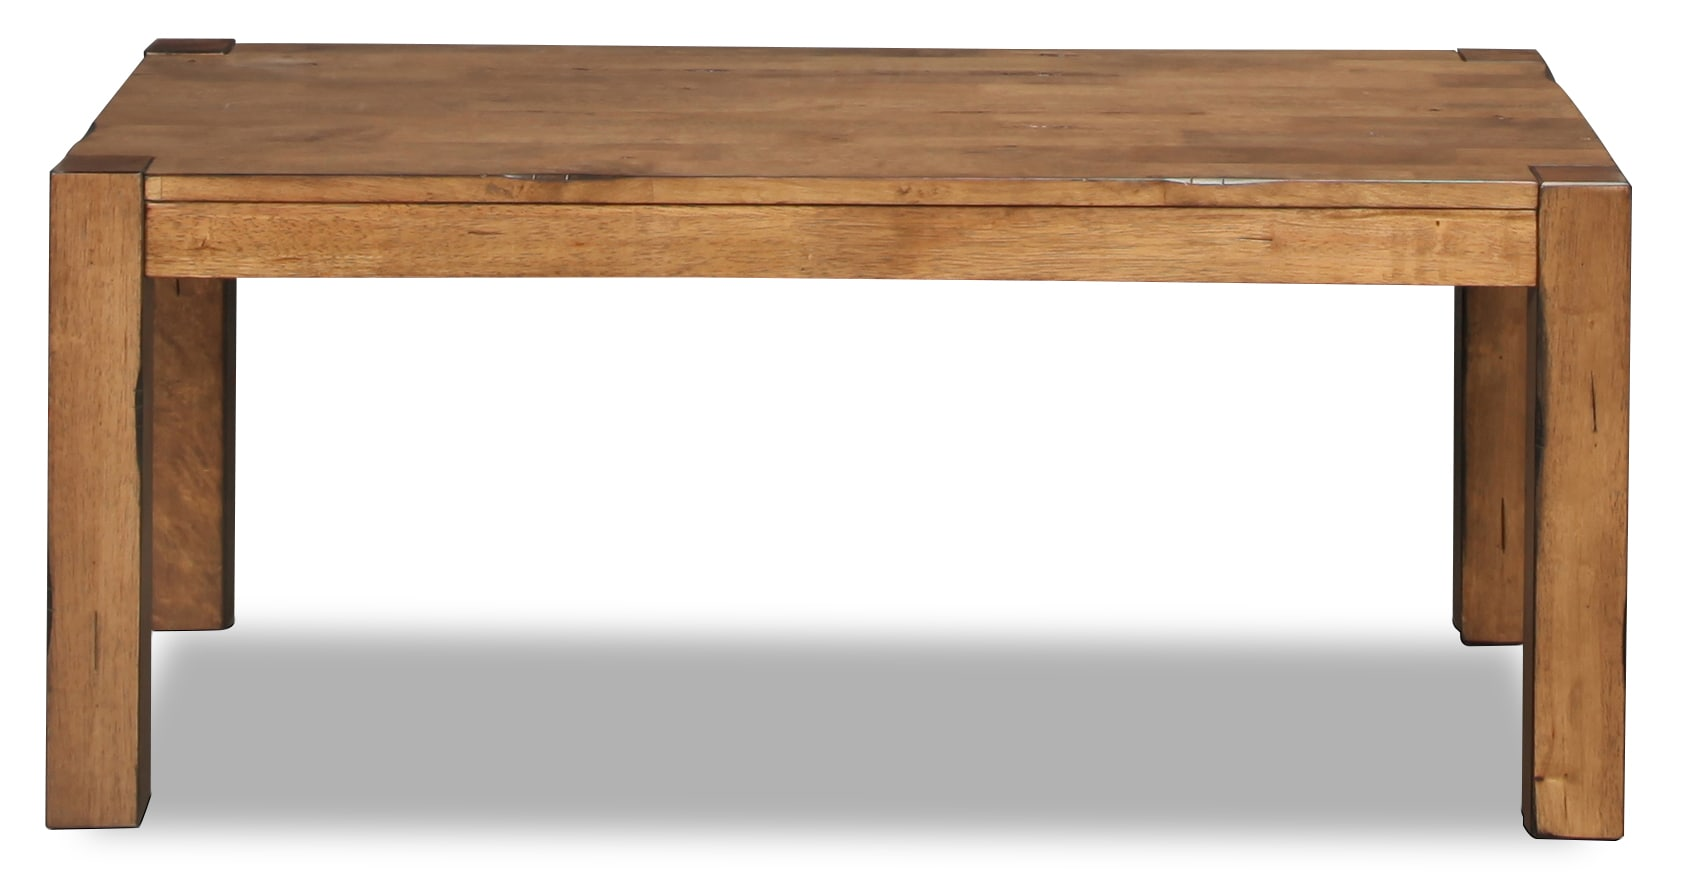 Kitt Coffee Table